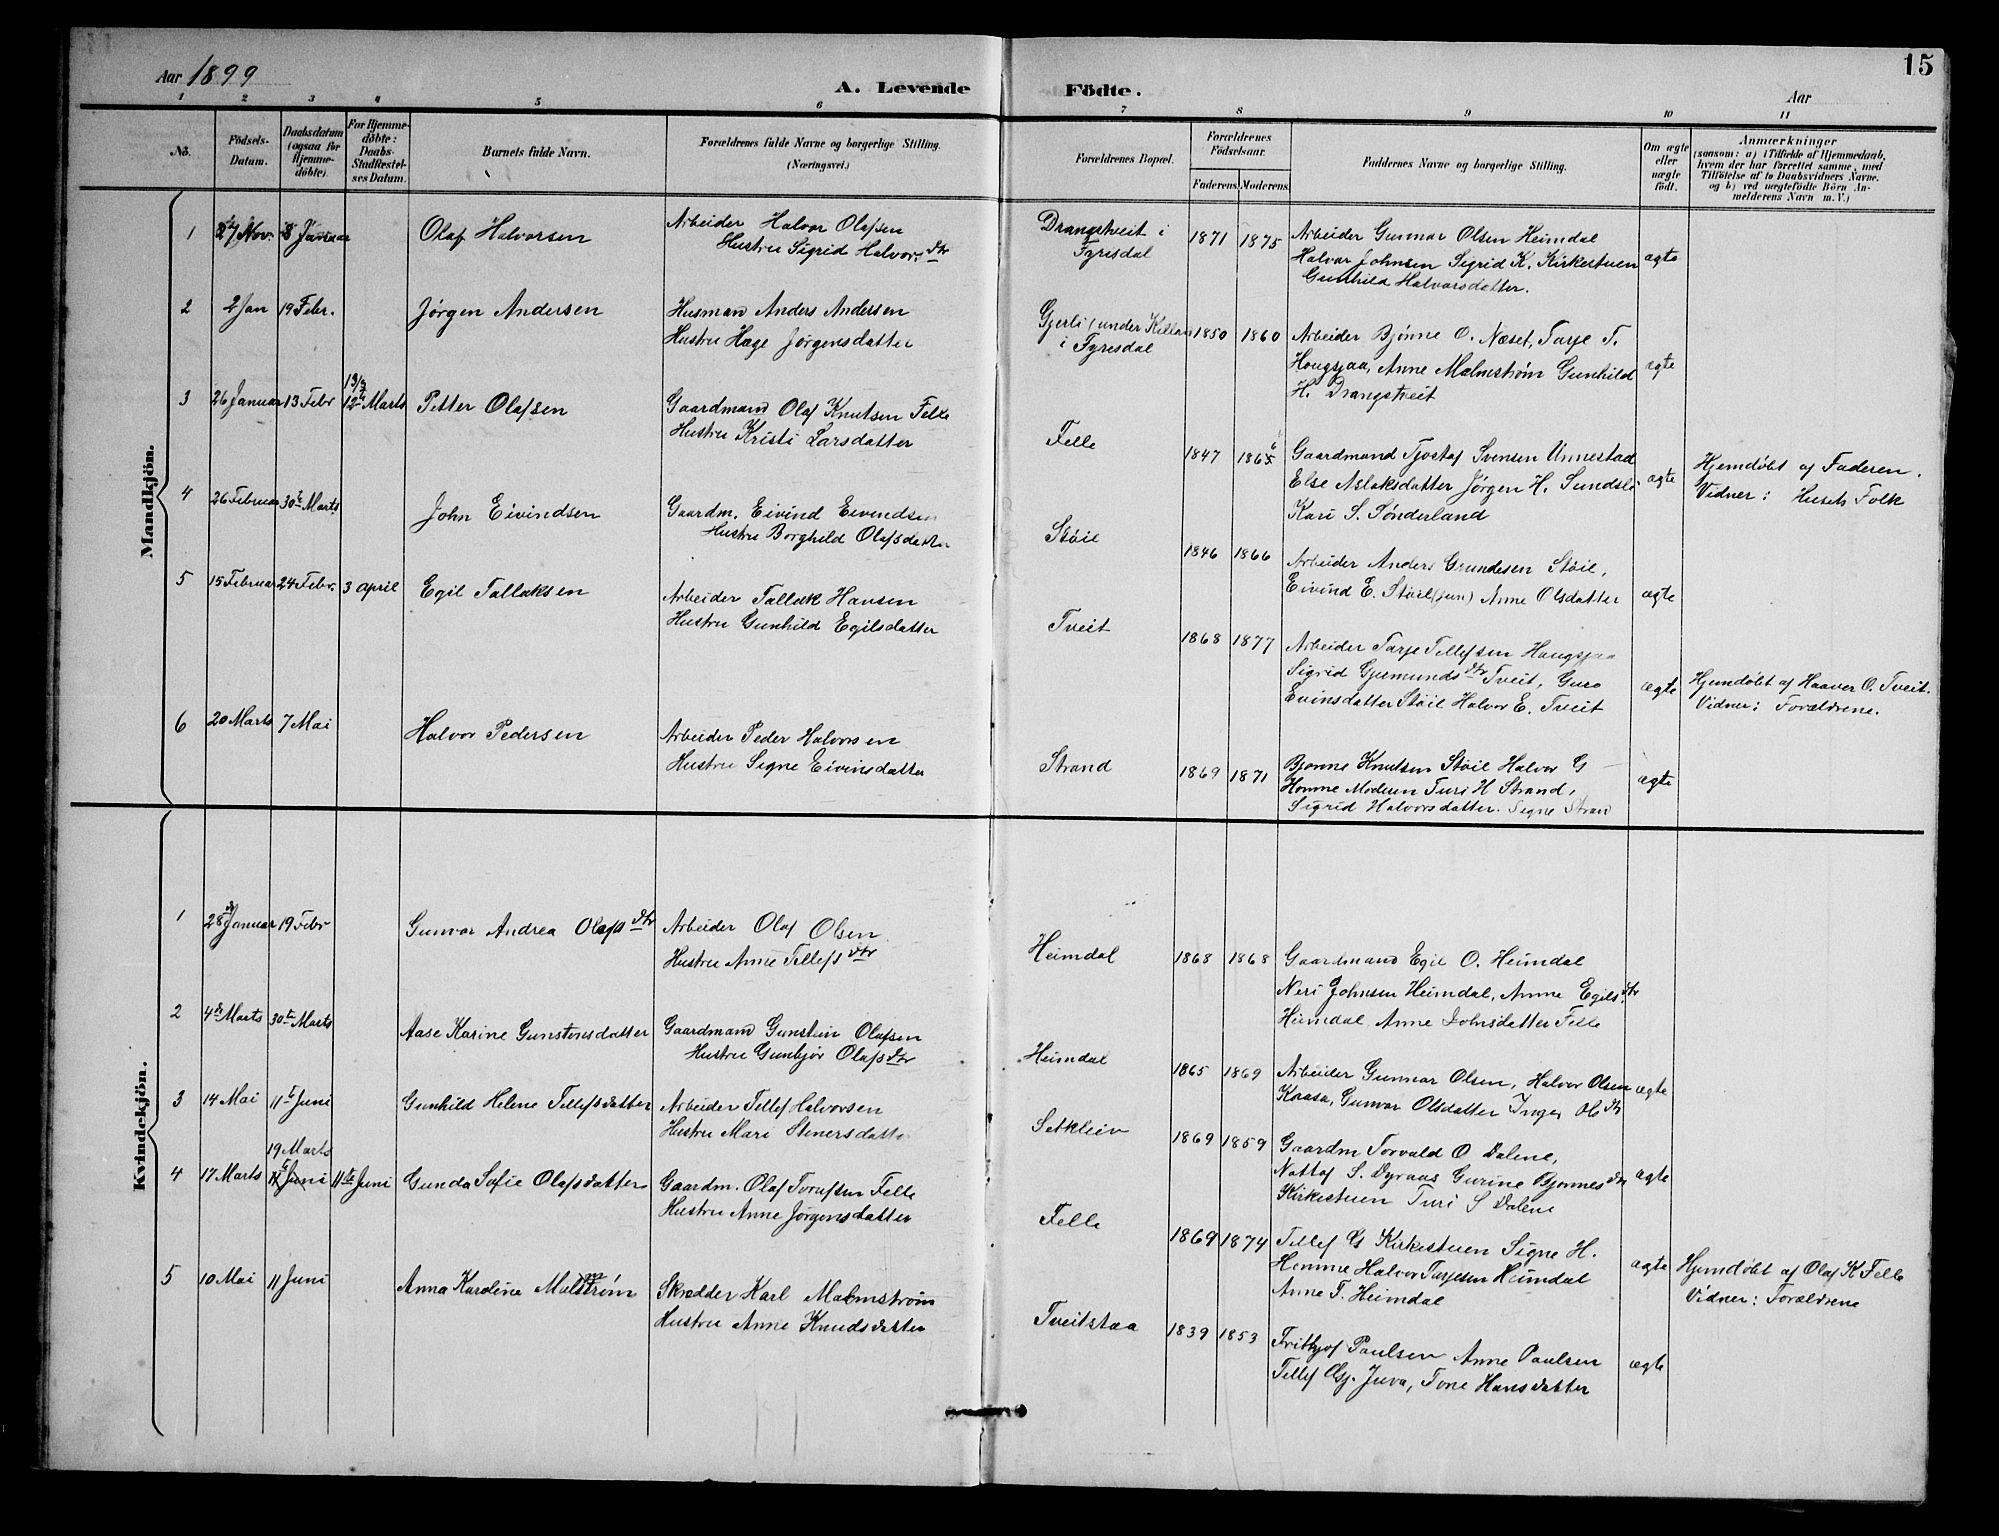 SAKO, Nissedal kirkebøker, G/Gb/L0003: Klokkerbok nr. II 3, 1893-1928, s. 15